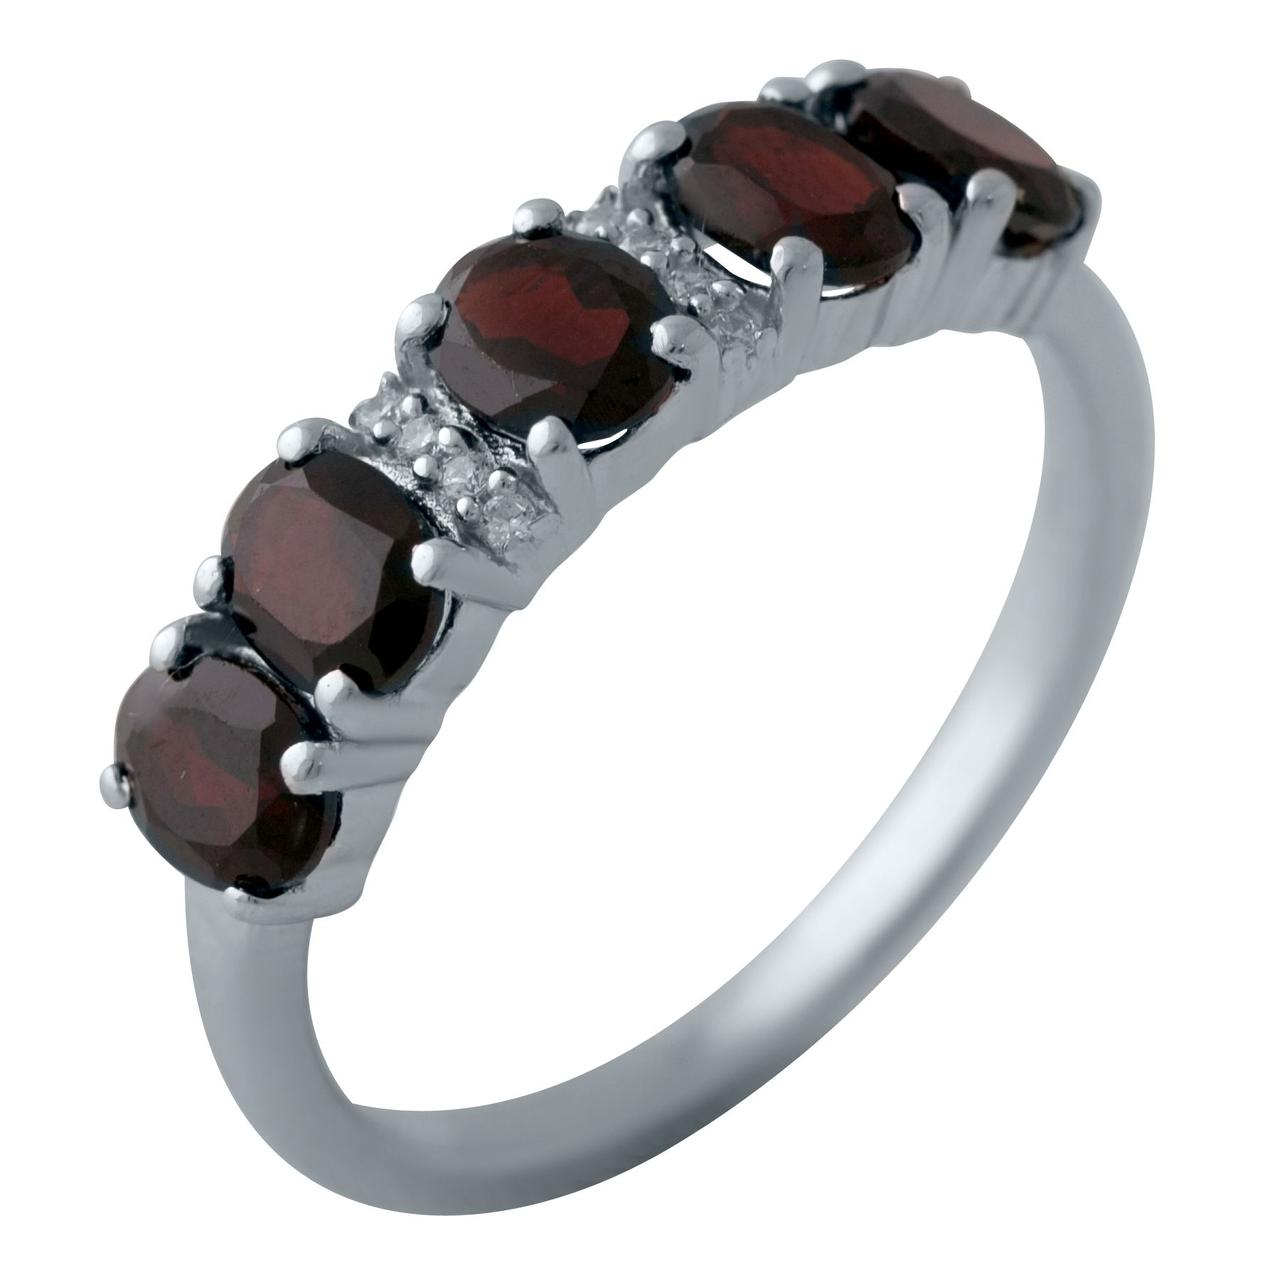 Серебряное кольцо DreamJewelry с натуральным гранатом 2.422ct (2005872) 17.5 размер